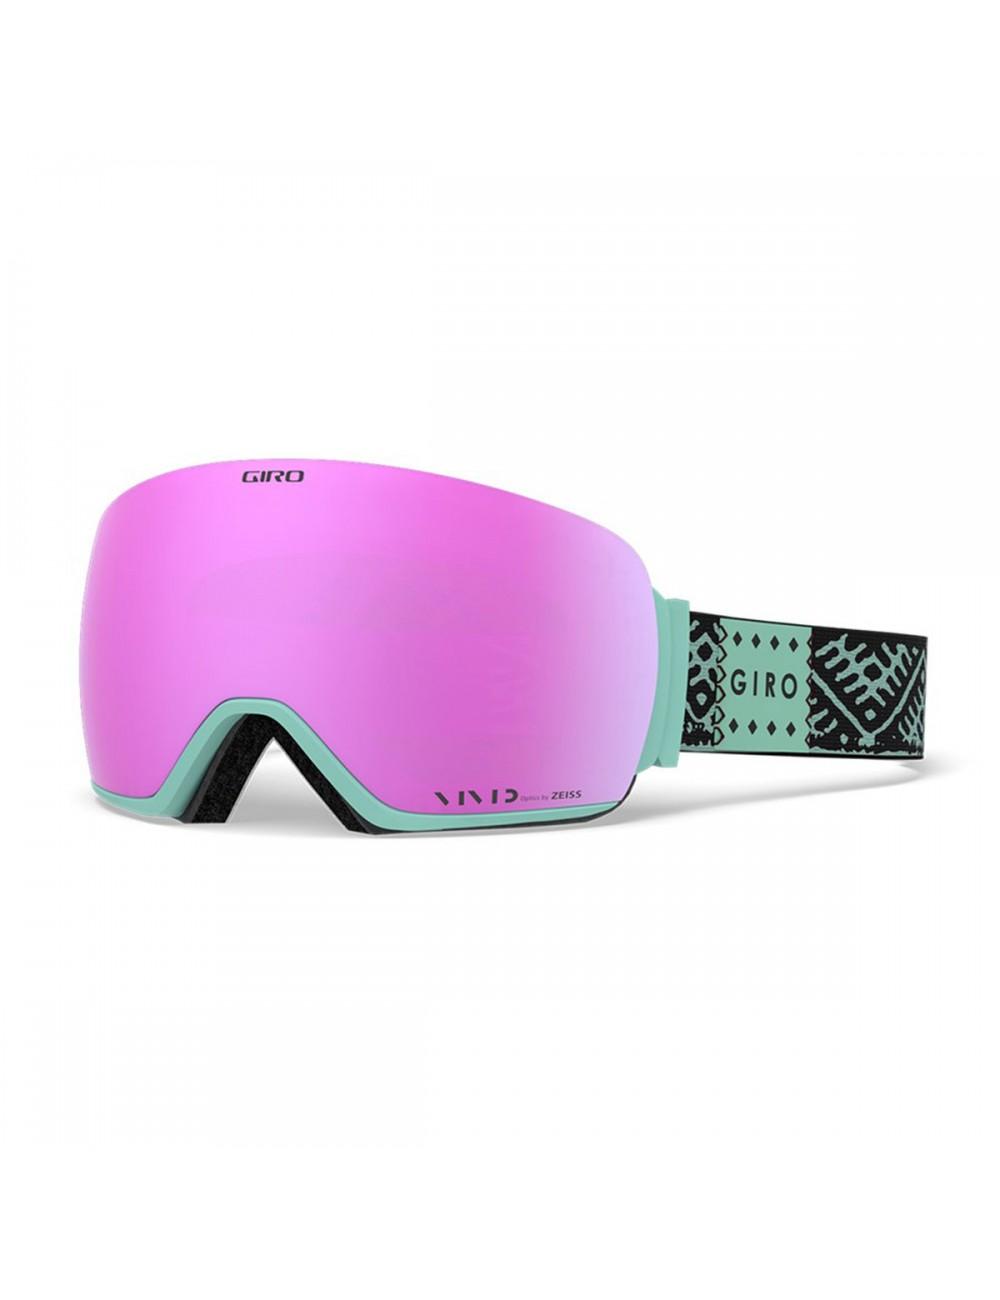 Giro Lusi Vivid Goggle - Frost Casablanca_1000875